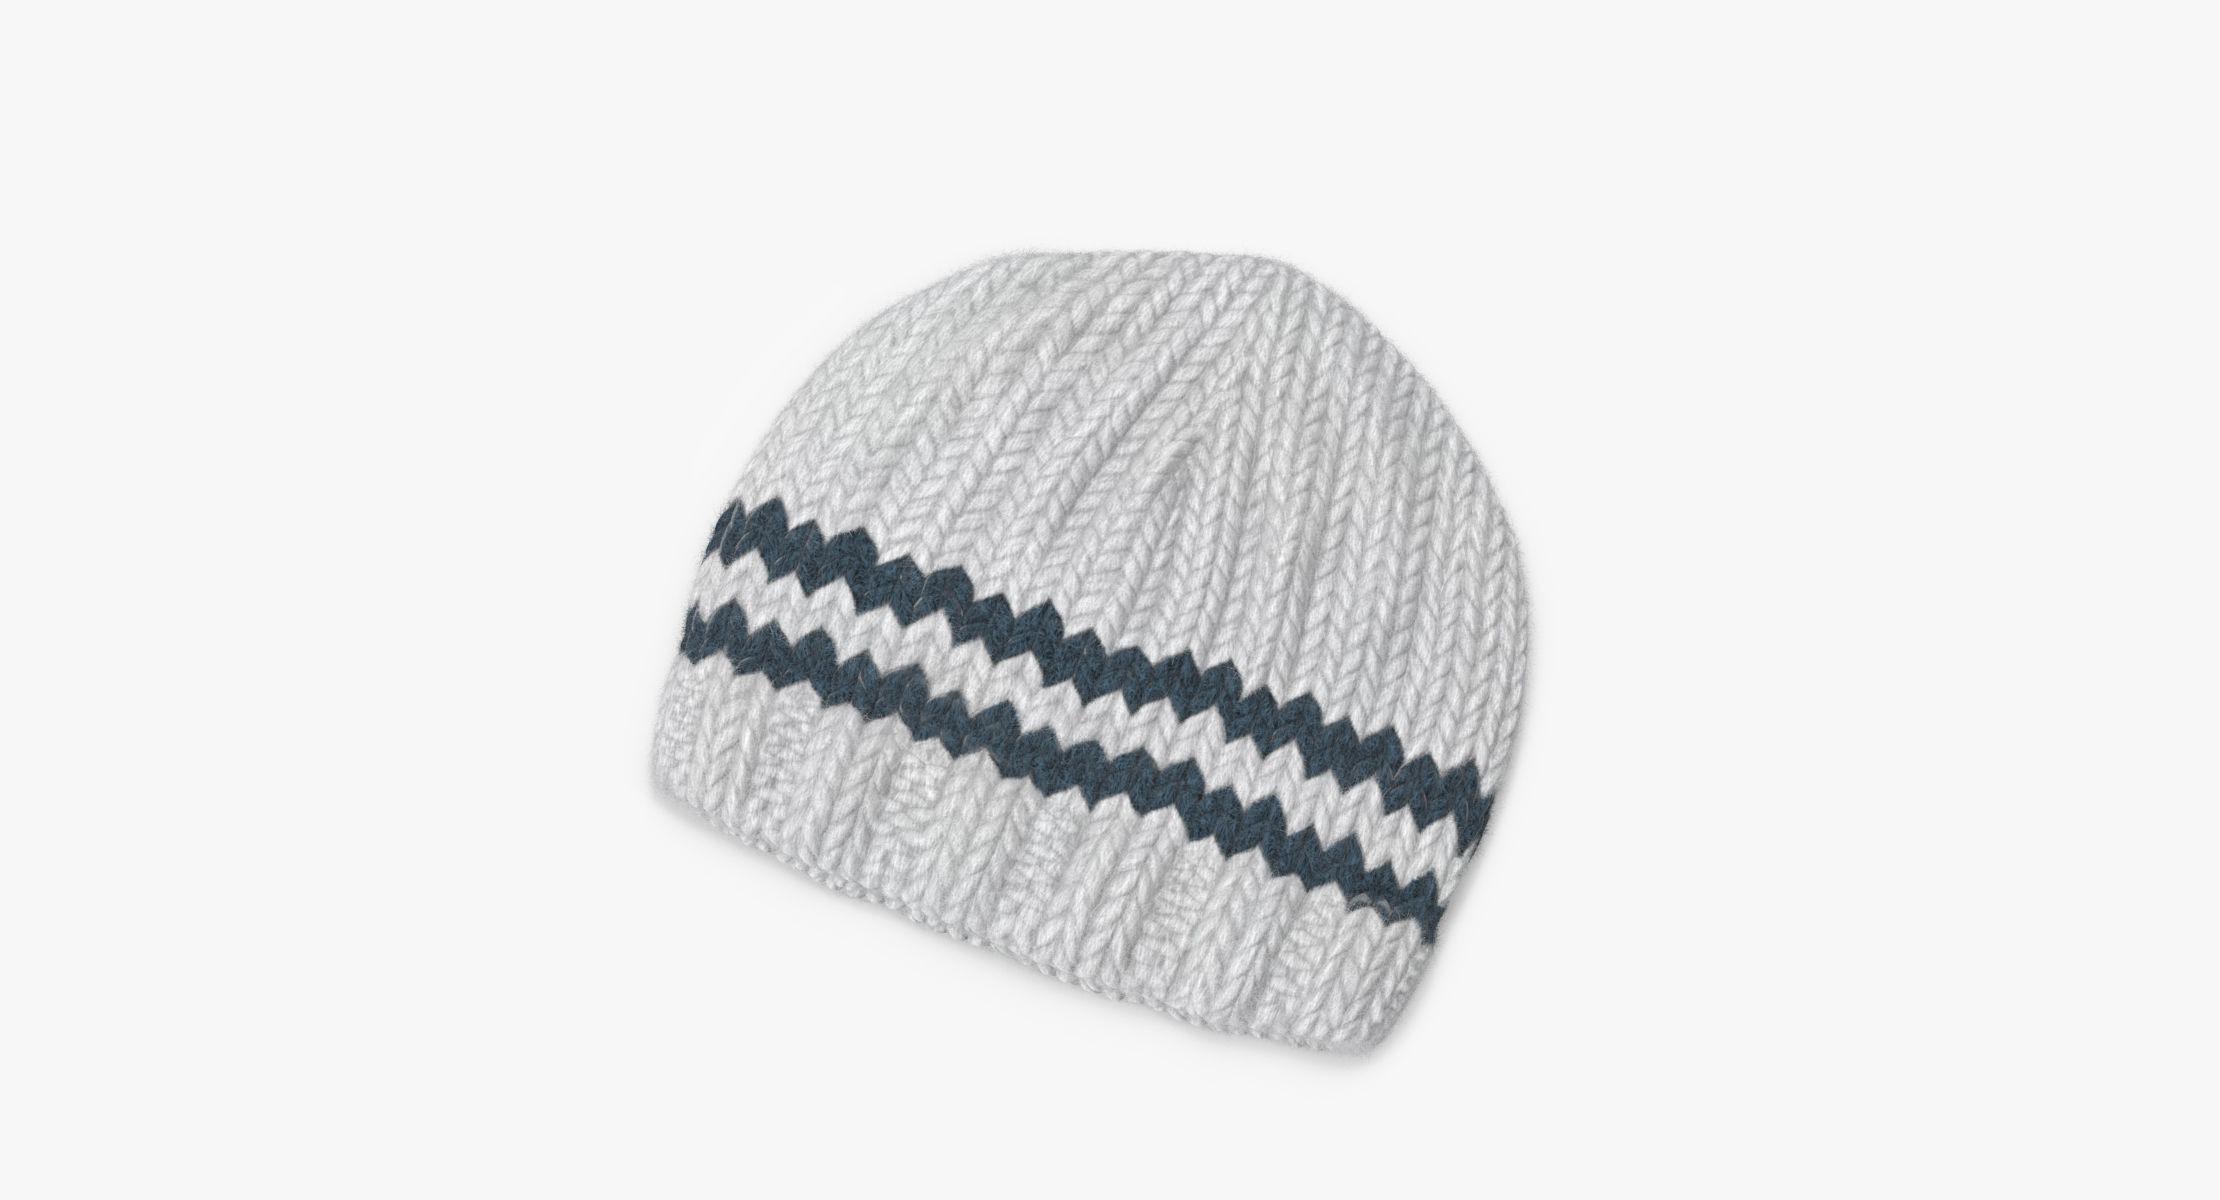 Newborn Cap 02 - reel 1